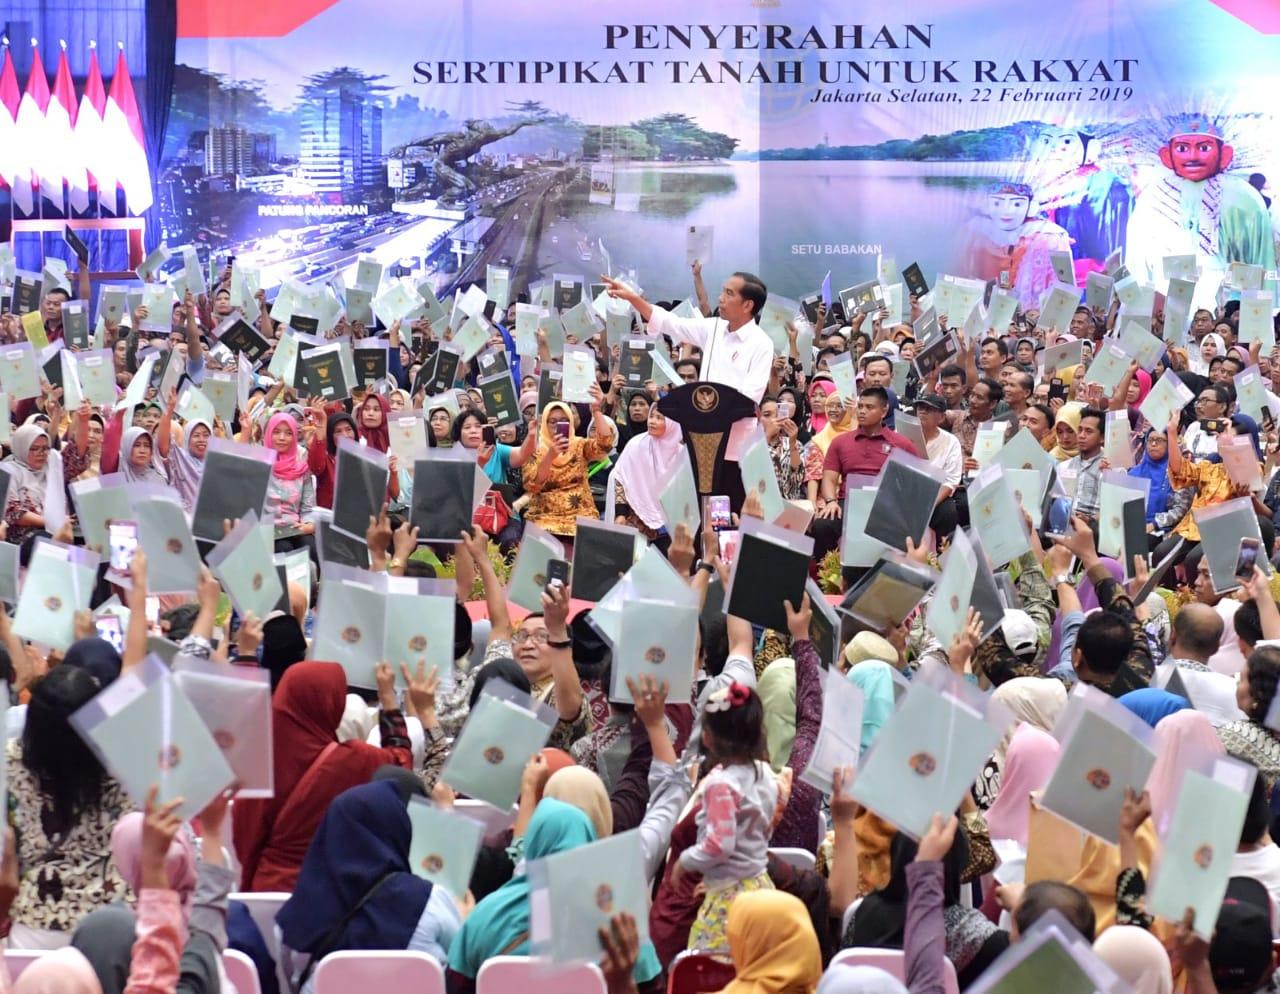 Presiden Jokowi Dukung Upaya Penuntasan Mafia Sepak Bola